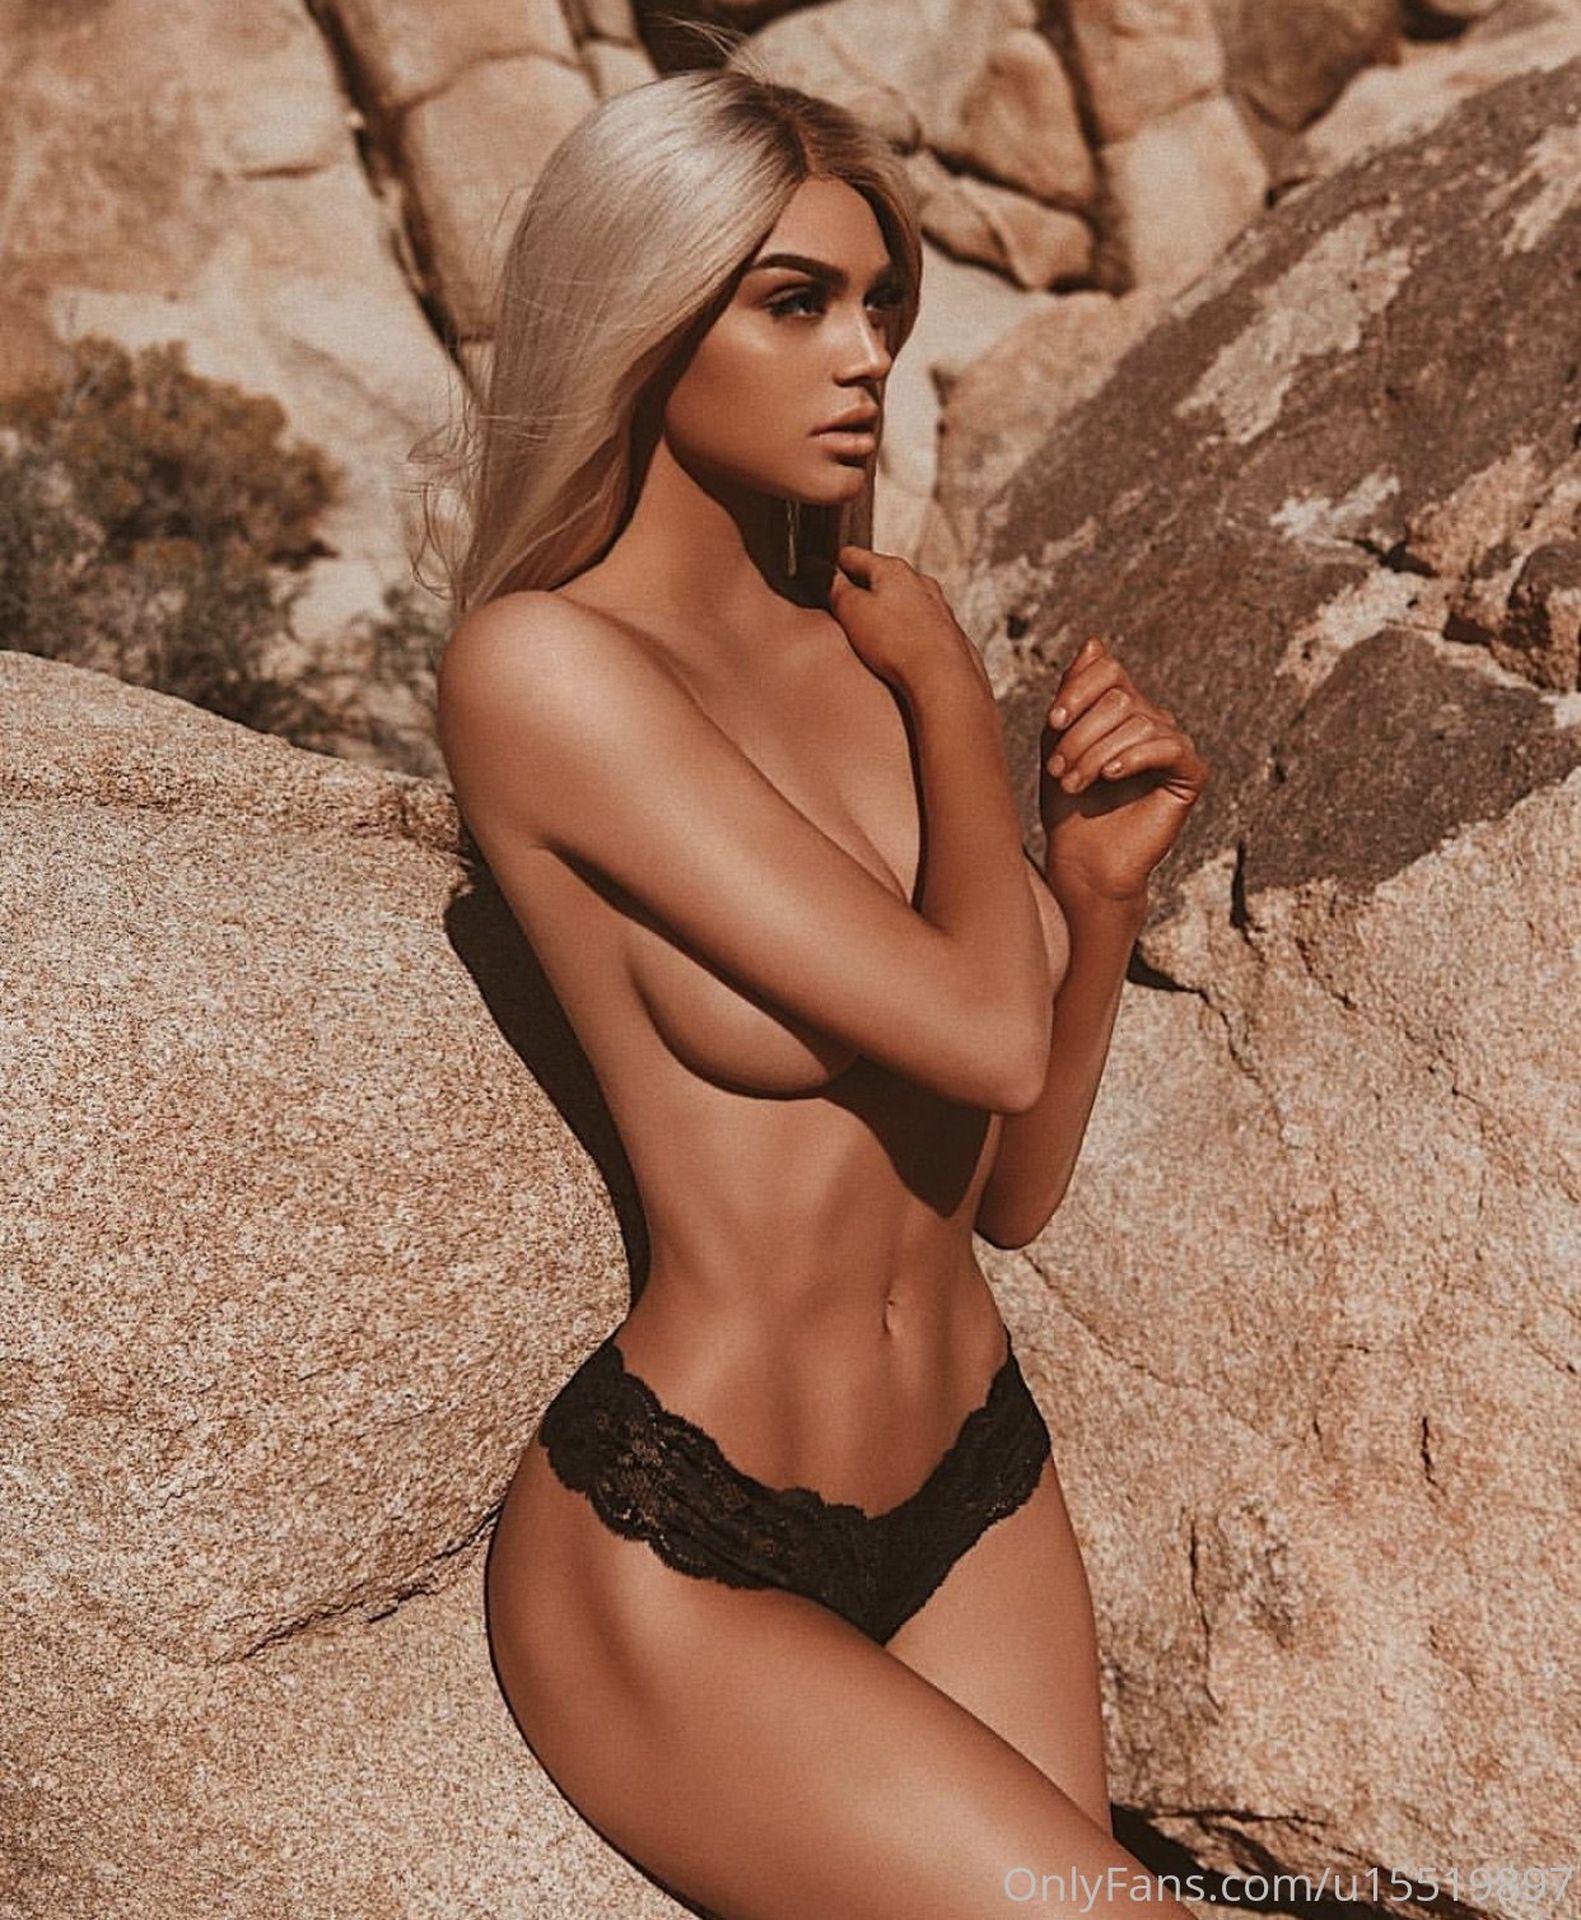 Kristen Hancher, Onlyfans Nudes Leaks 0006